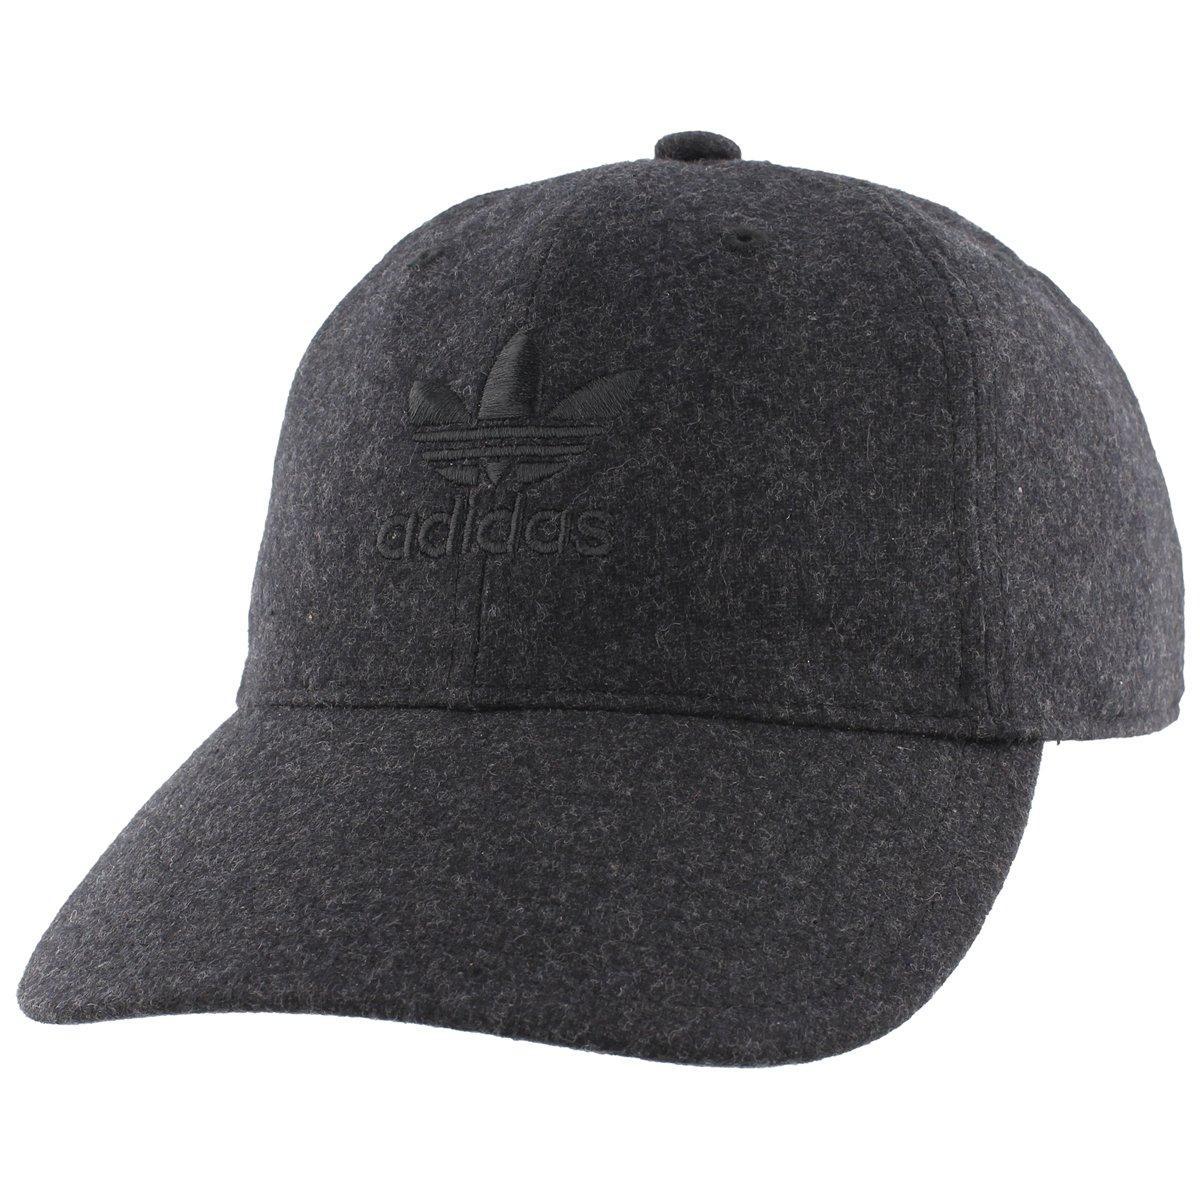 c70754d7af6 Amazon.com  adidas Women s Originals Relaxed Plus Adjustable Strapback Cap